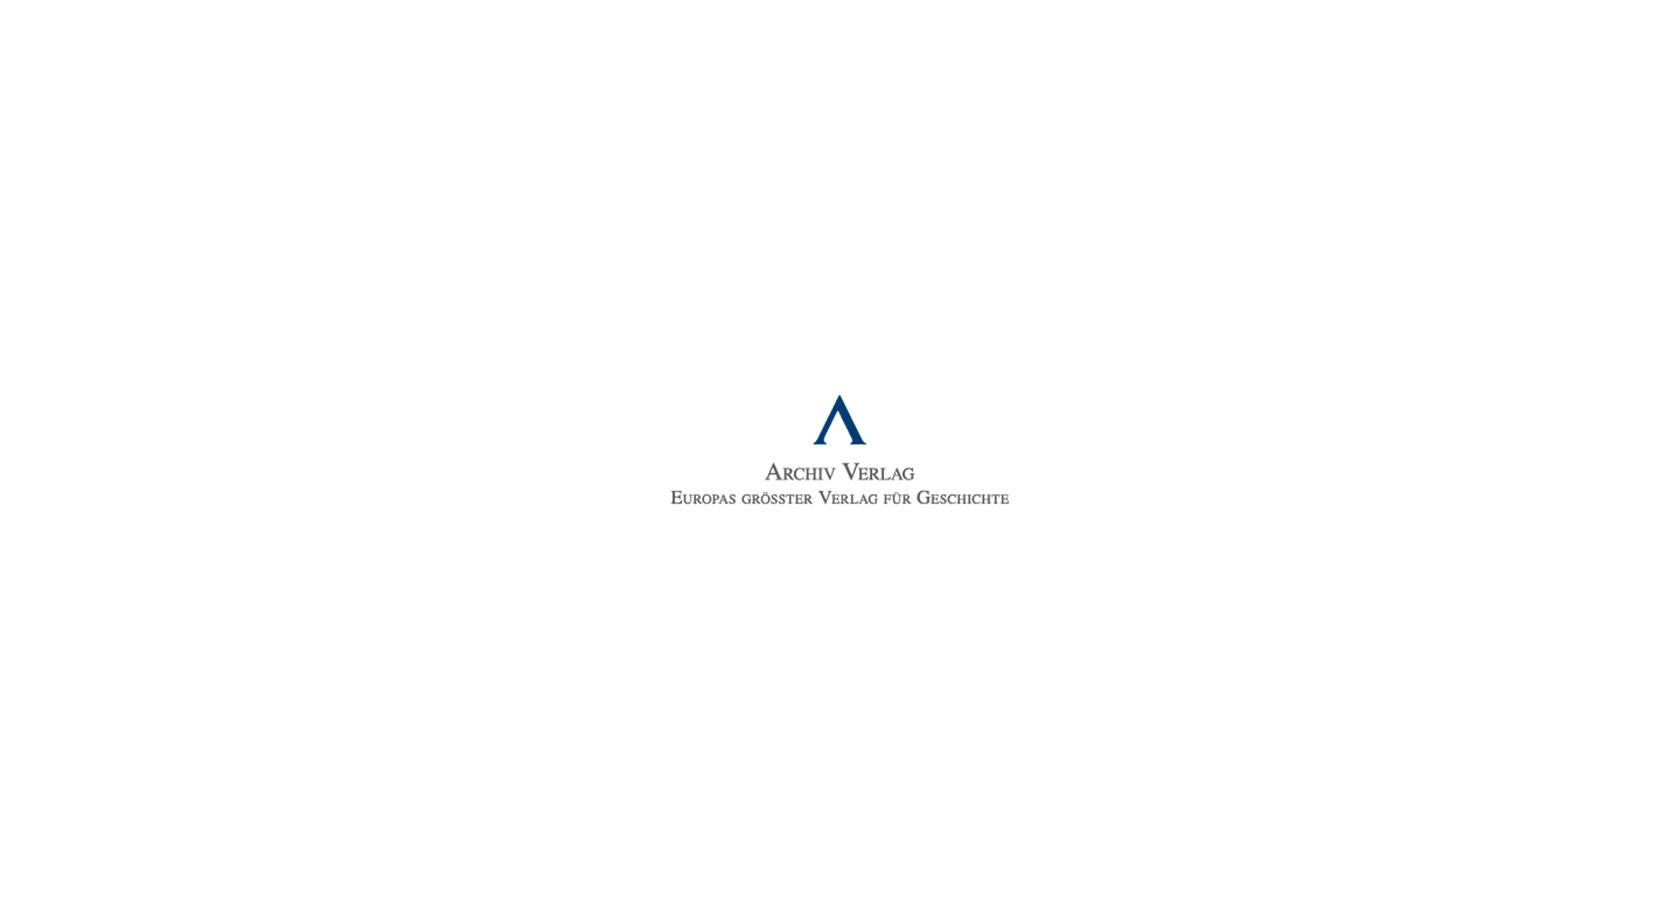 Logo des Archiv Verlags